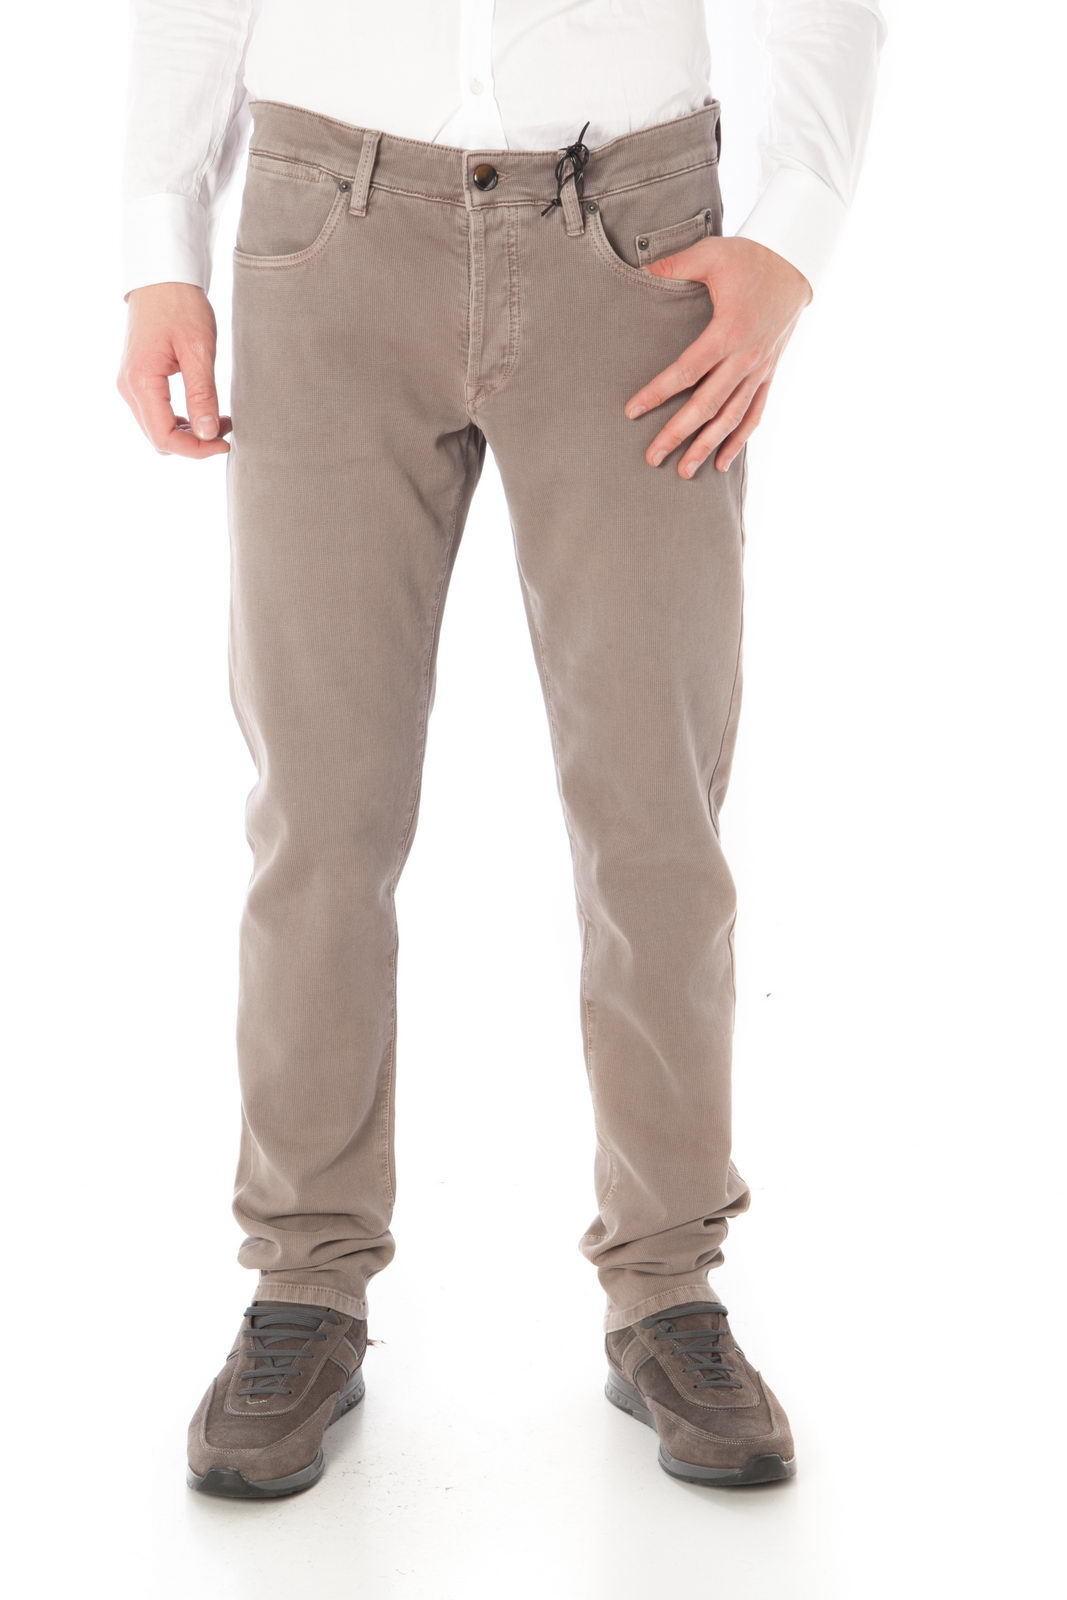 Pantaloni Siviglia Jeans Trouser ITALY men brown SP021USR10032B019 S633